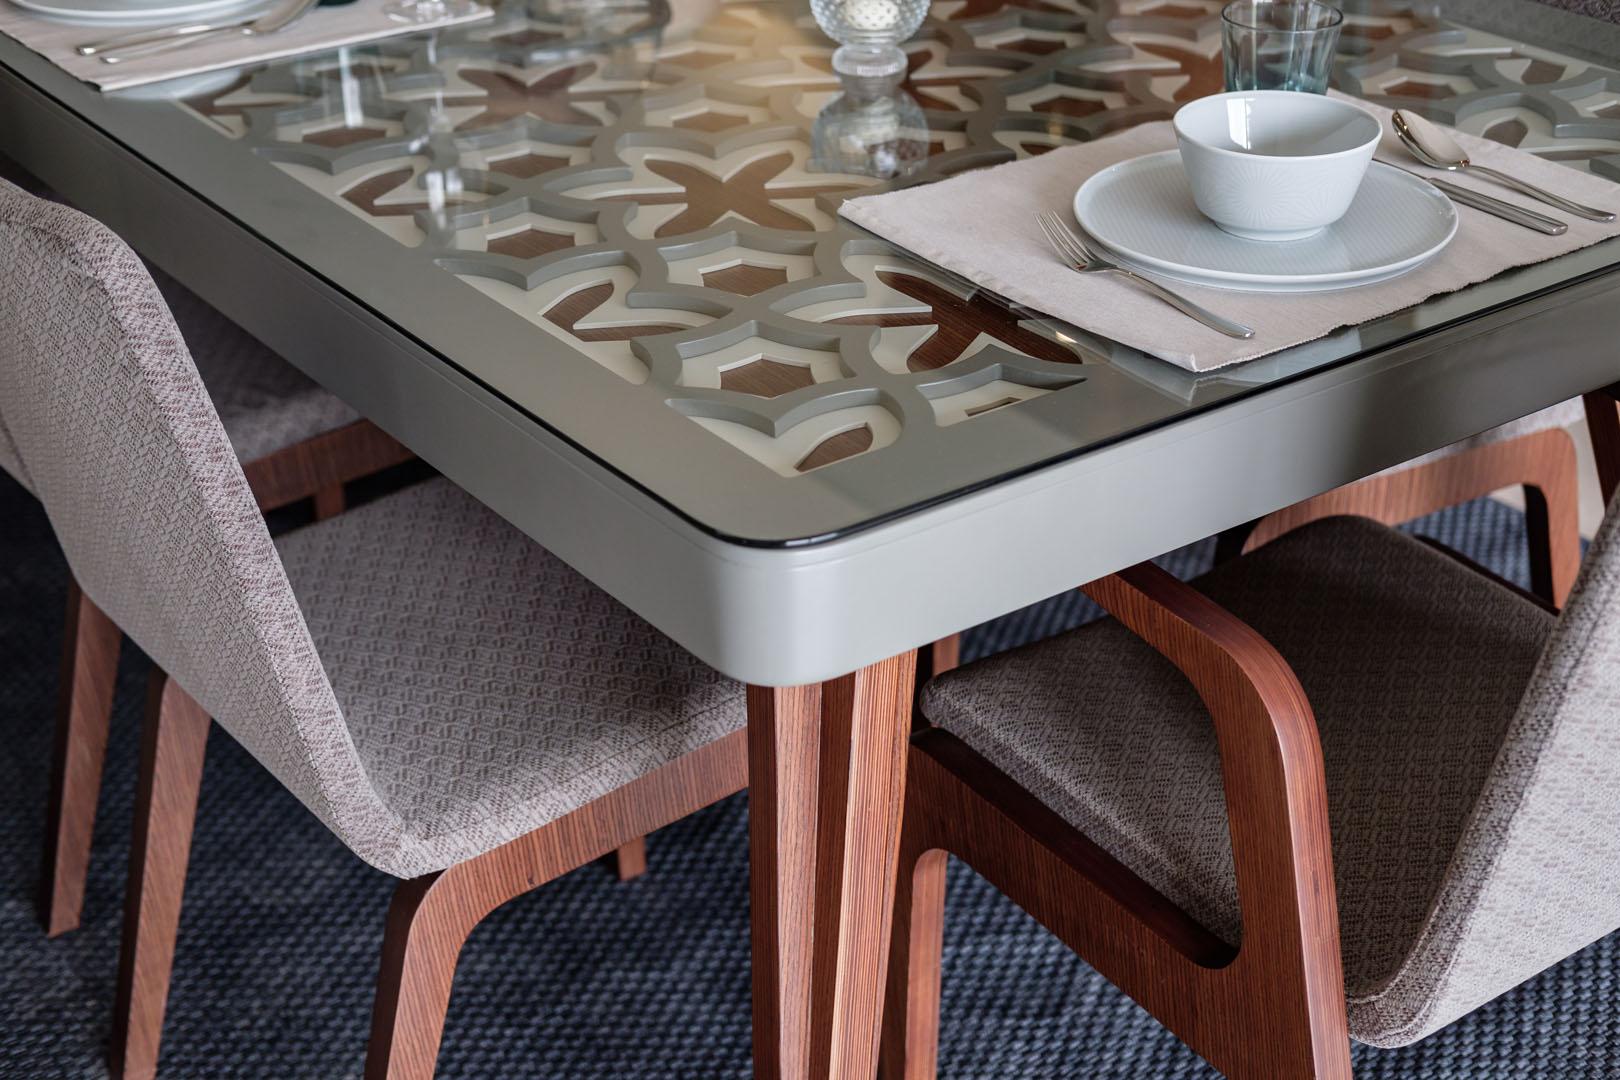 Andalusia dining - Pinocchio furniture